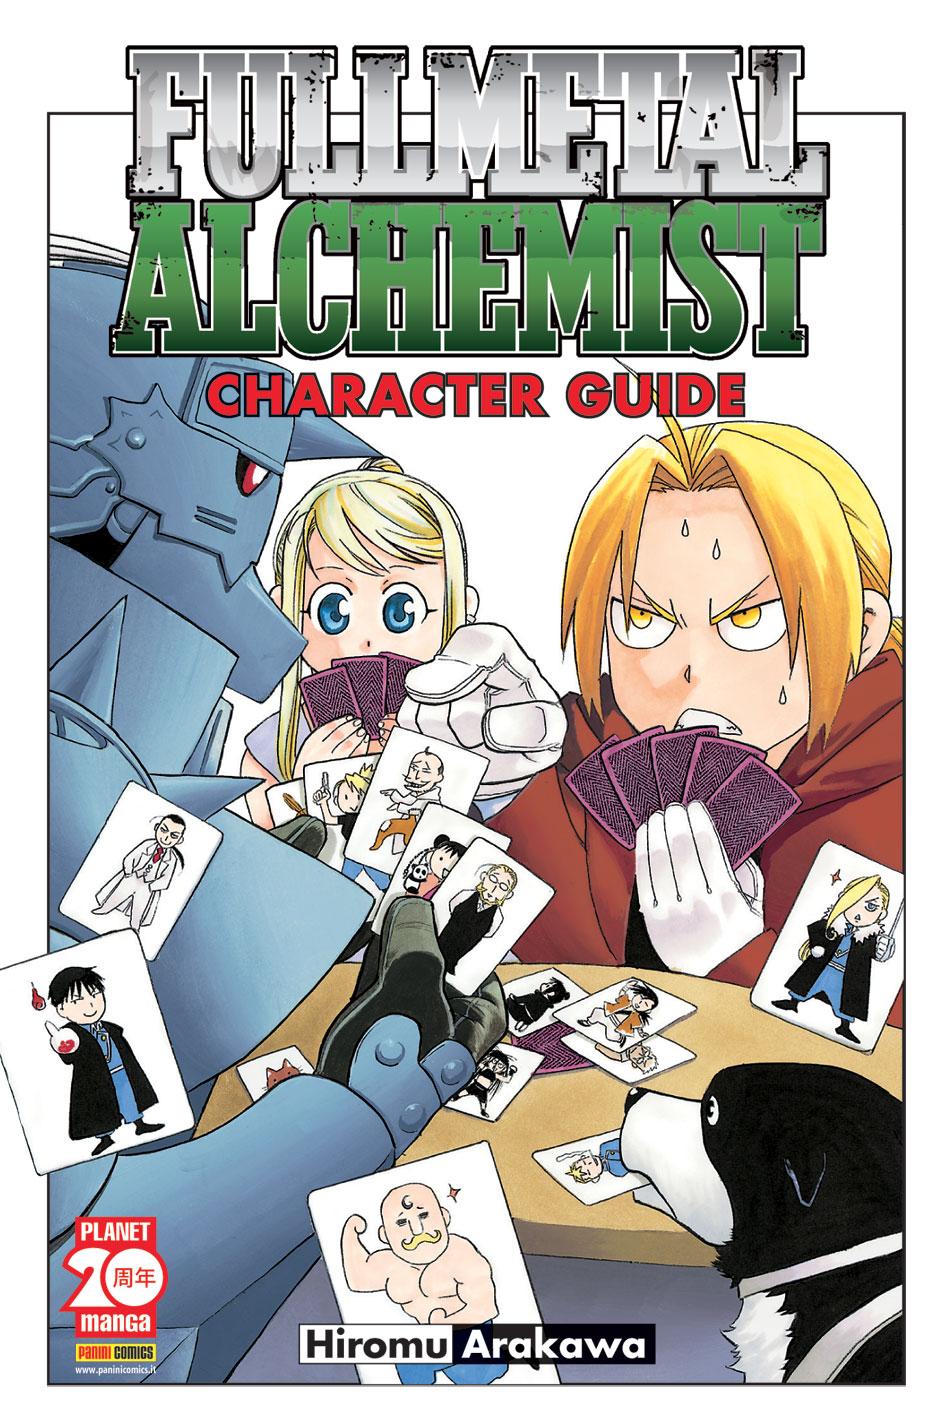 fullmetal_alchemist_character_guide